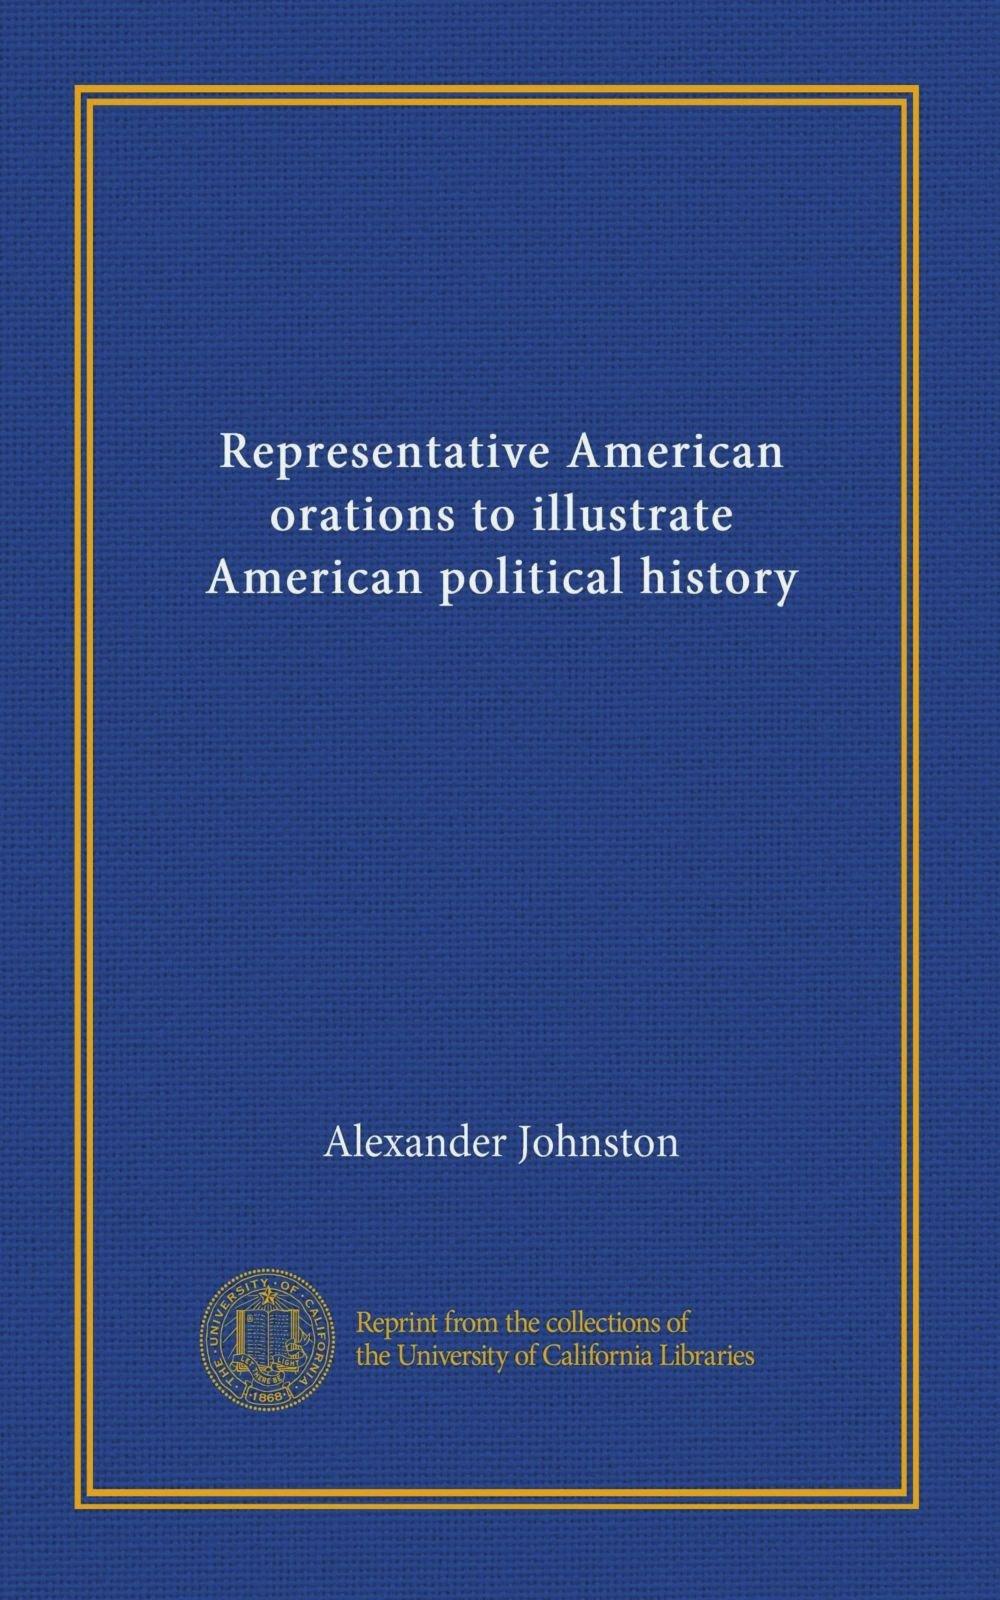 Representative American orations to illustrate American political history (v.2) ebook